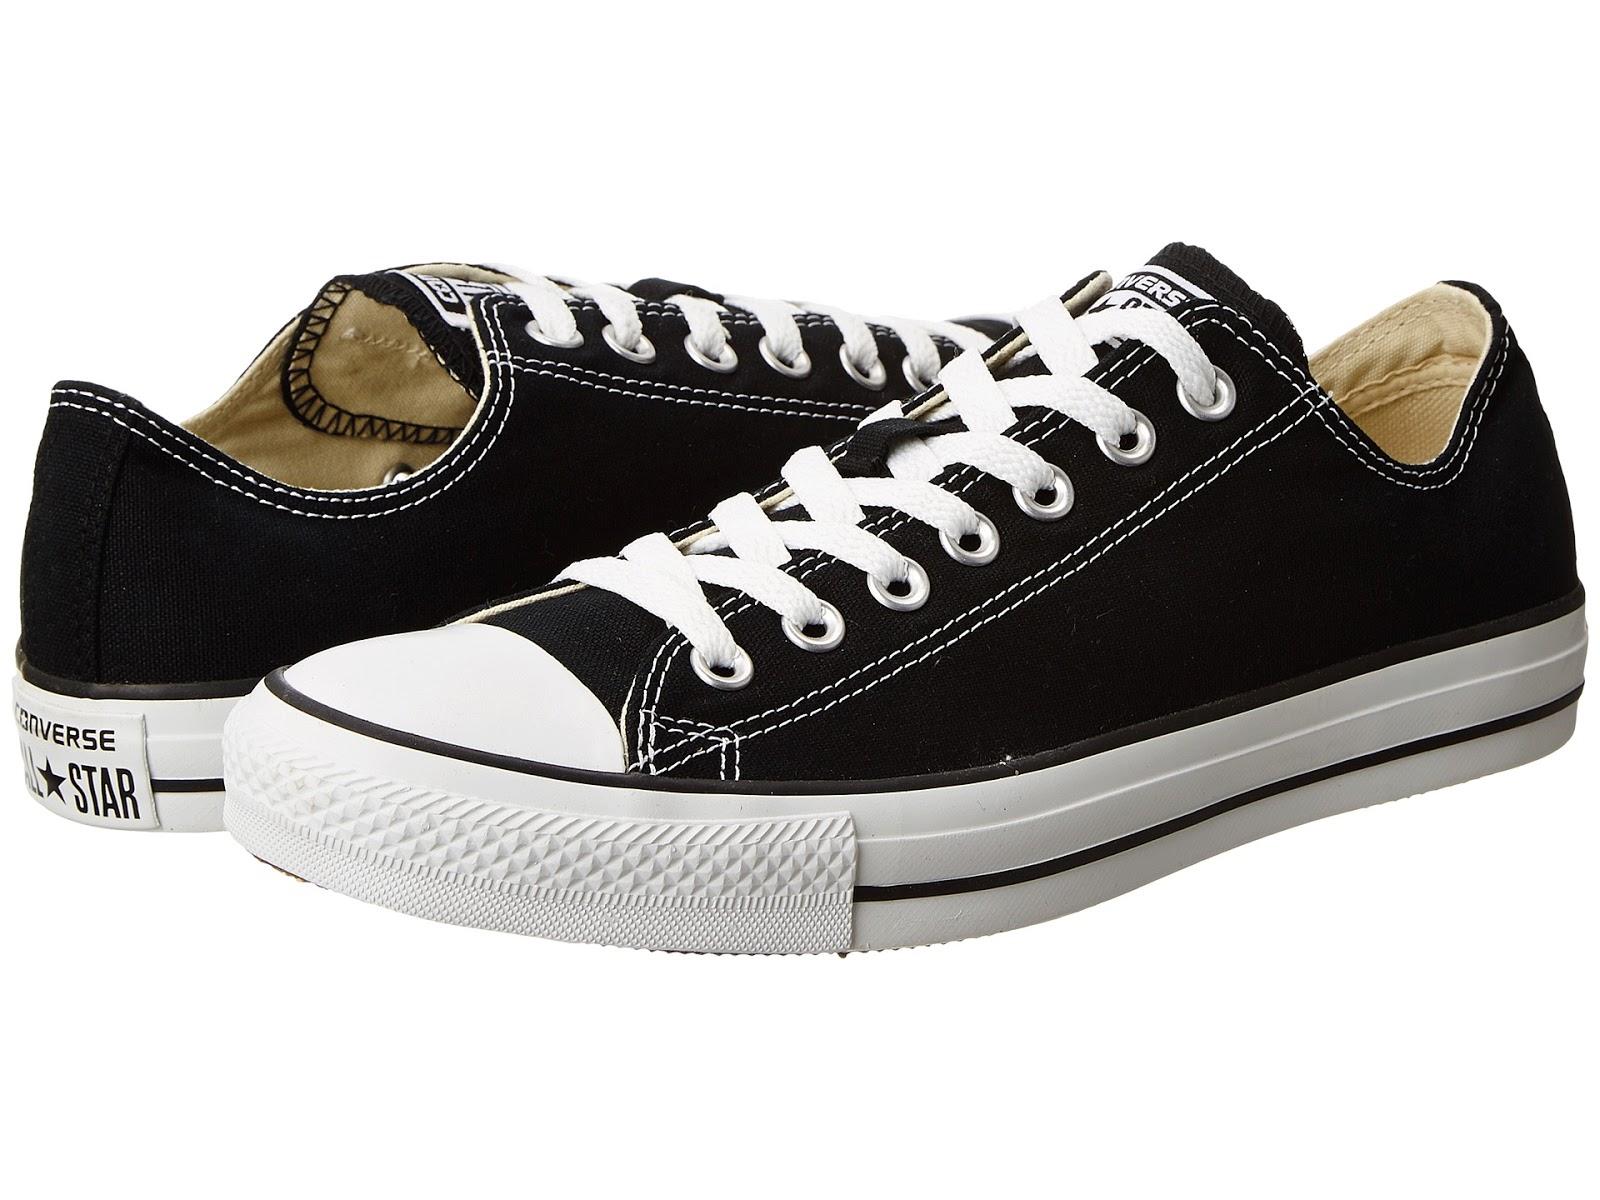 Cara Membedakan Sepatu Converse All Star Asli Sama Palsu - Bathekistik abd0ea8e54